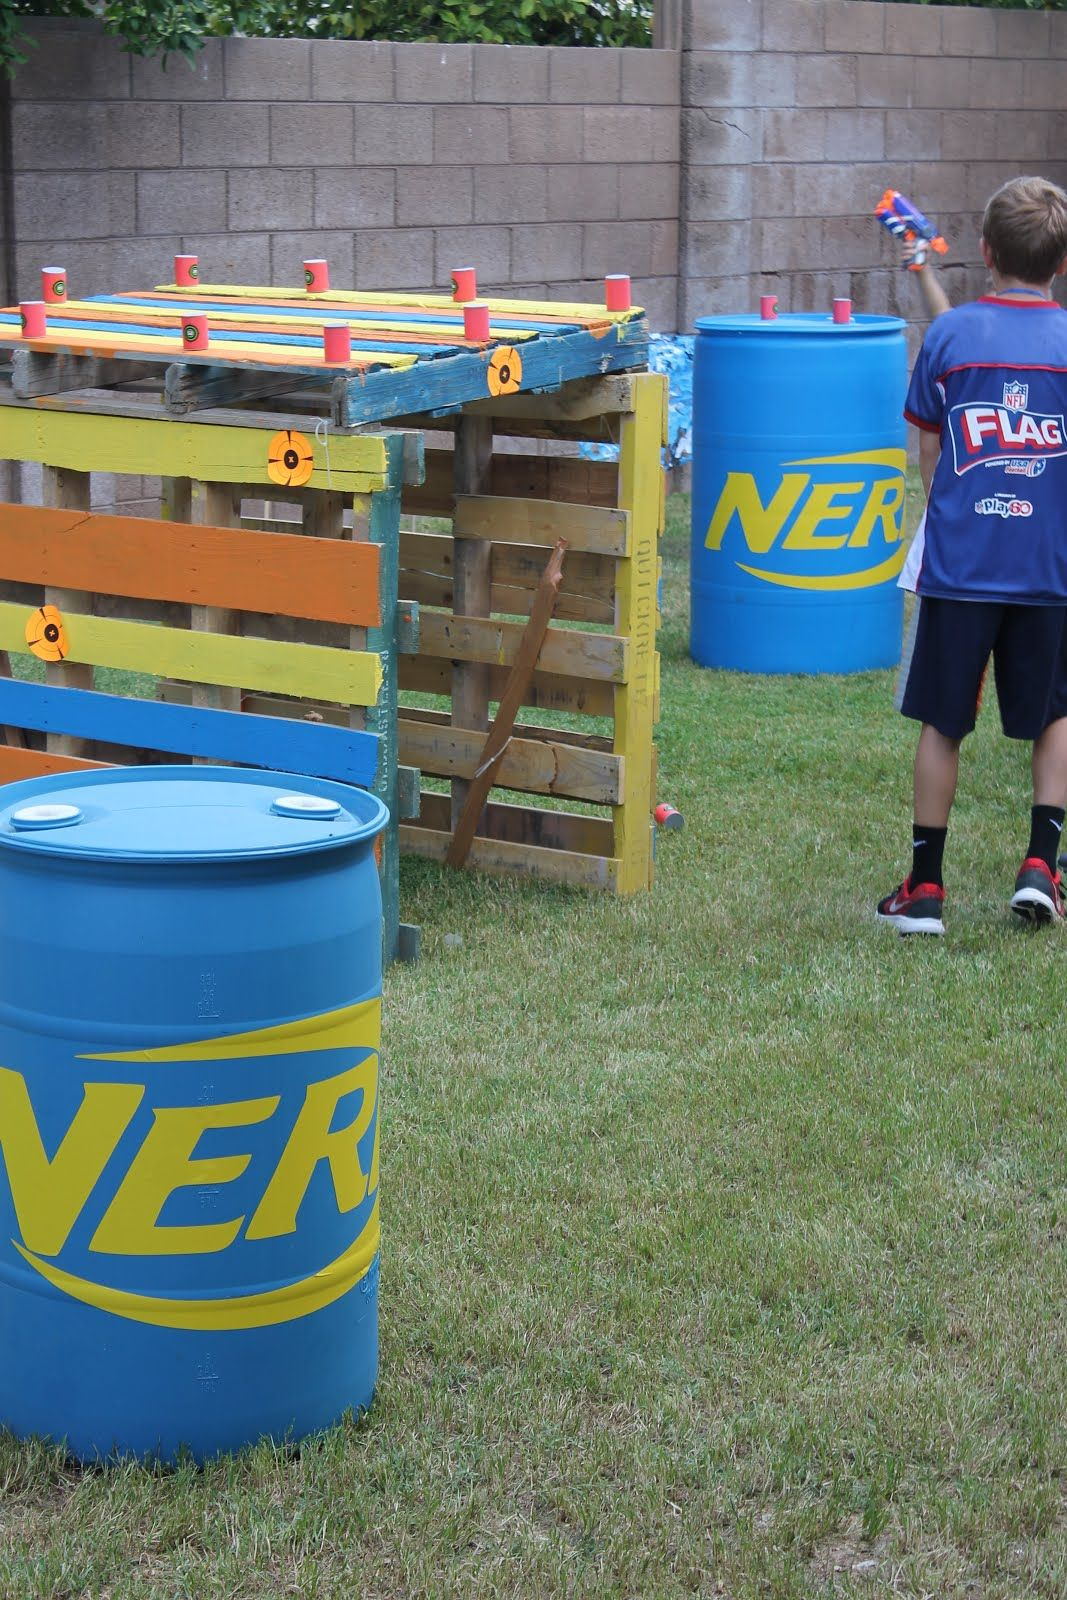 Pin On Nerf Backyard diy nerf war course